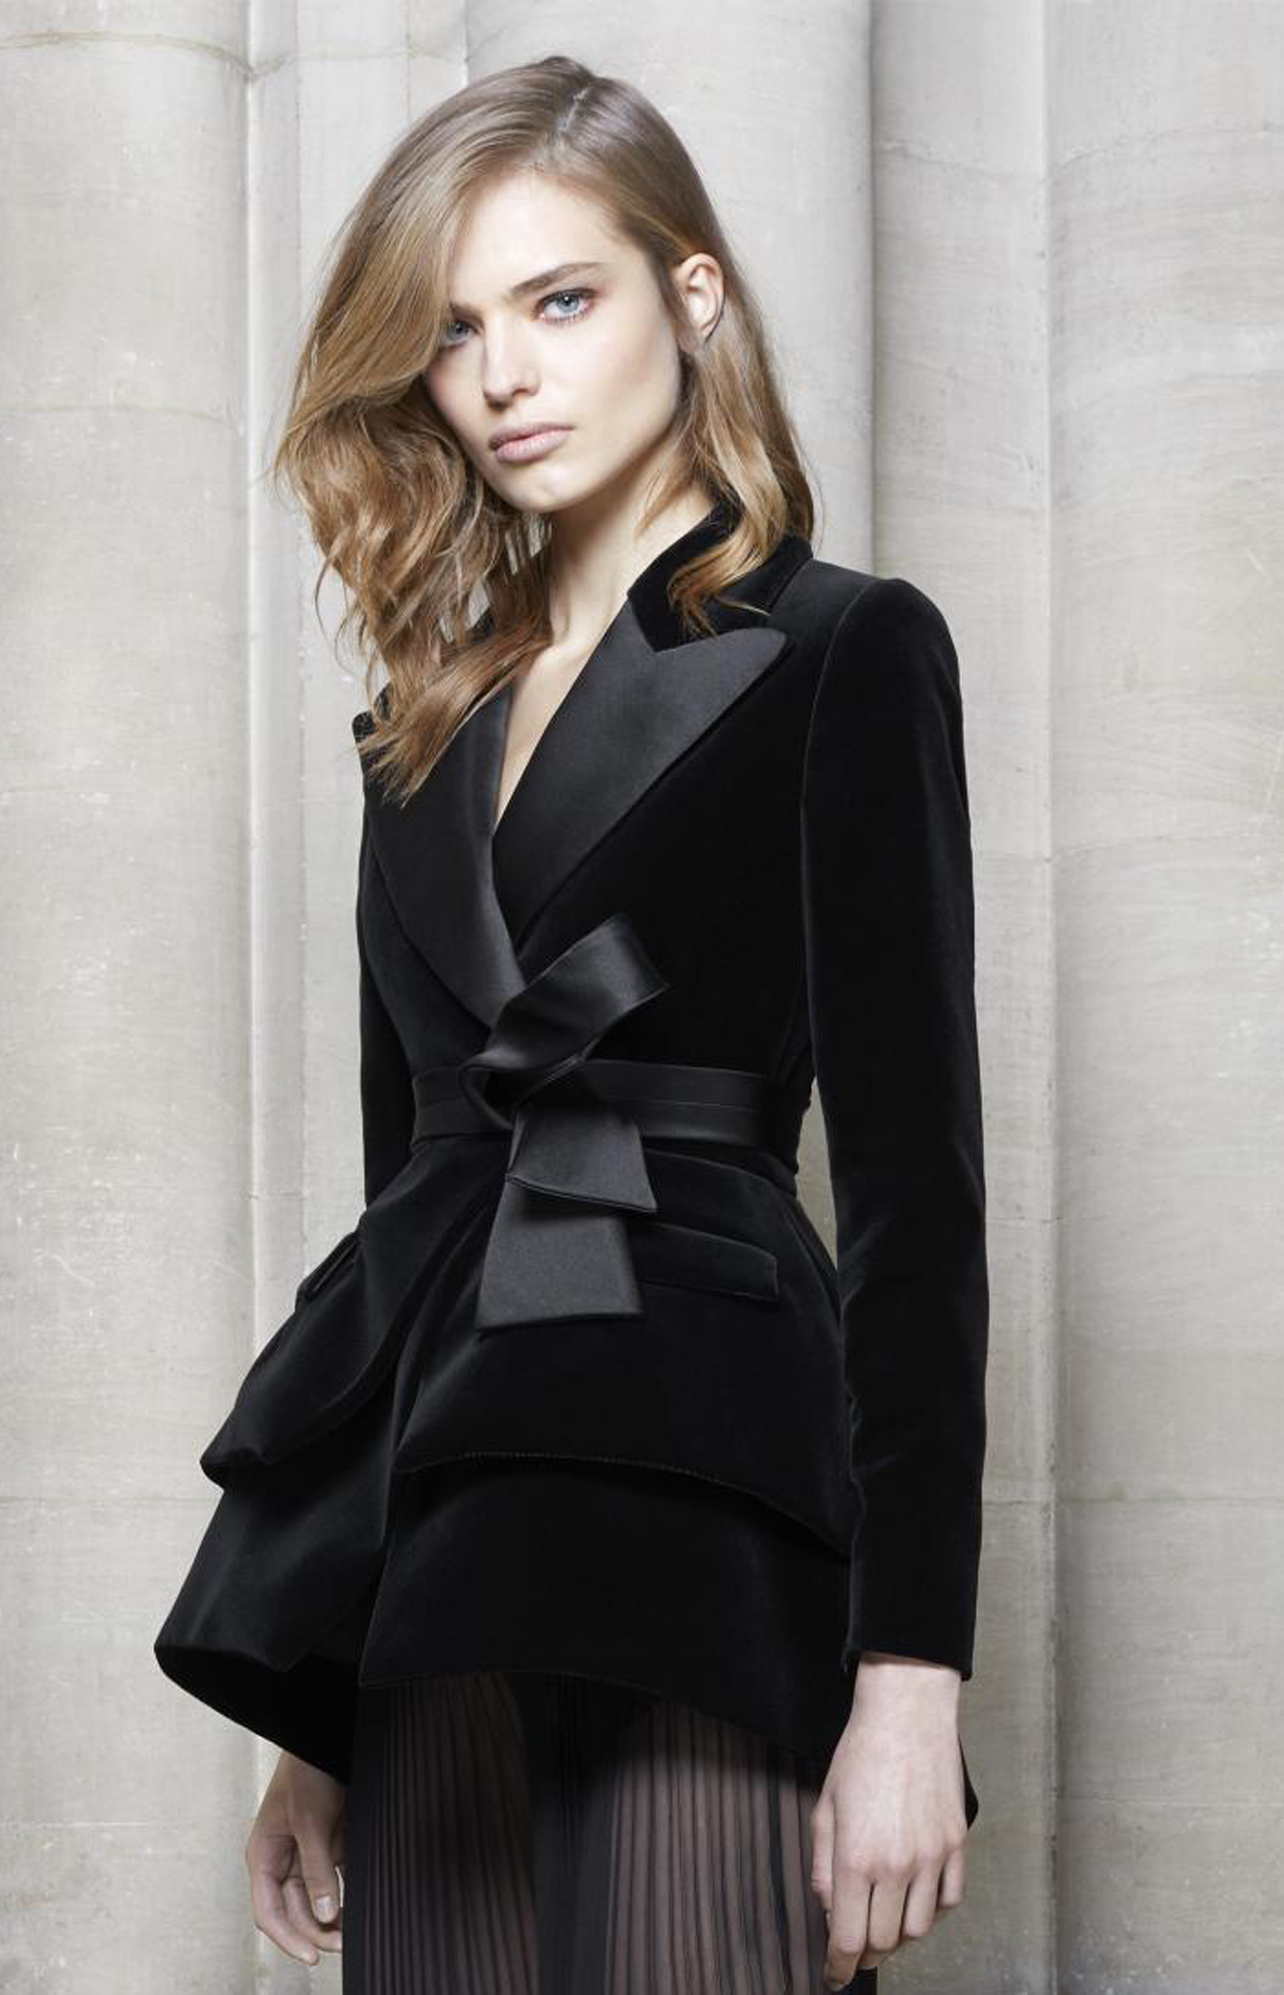 PADEGAO Fashion Velvet Women Suit Coat Graceful Slim Street Wear 2017 Black Elegant Female Clothing